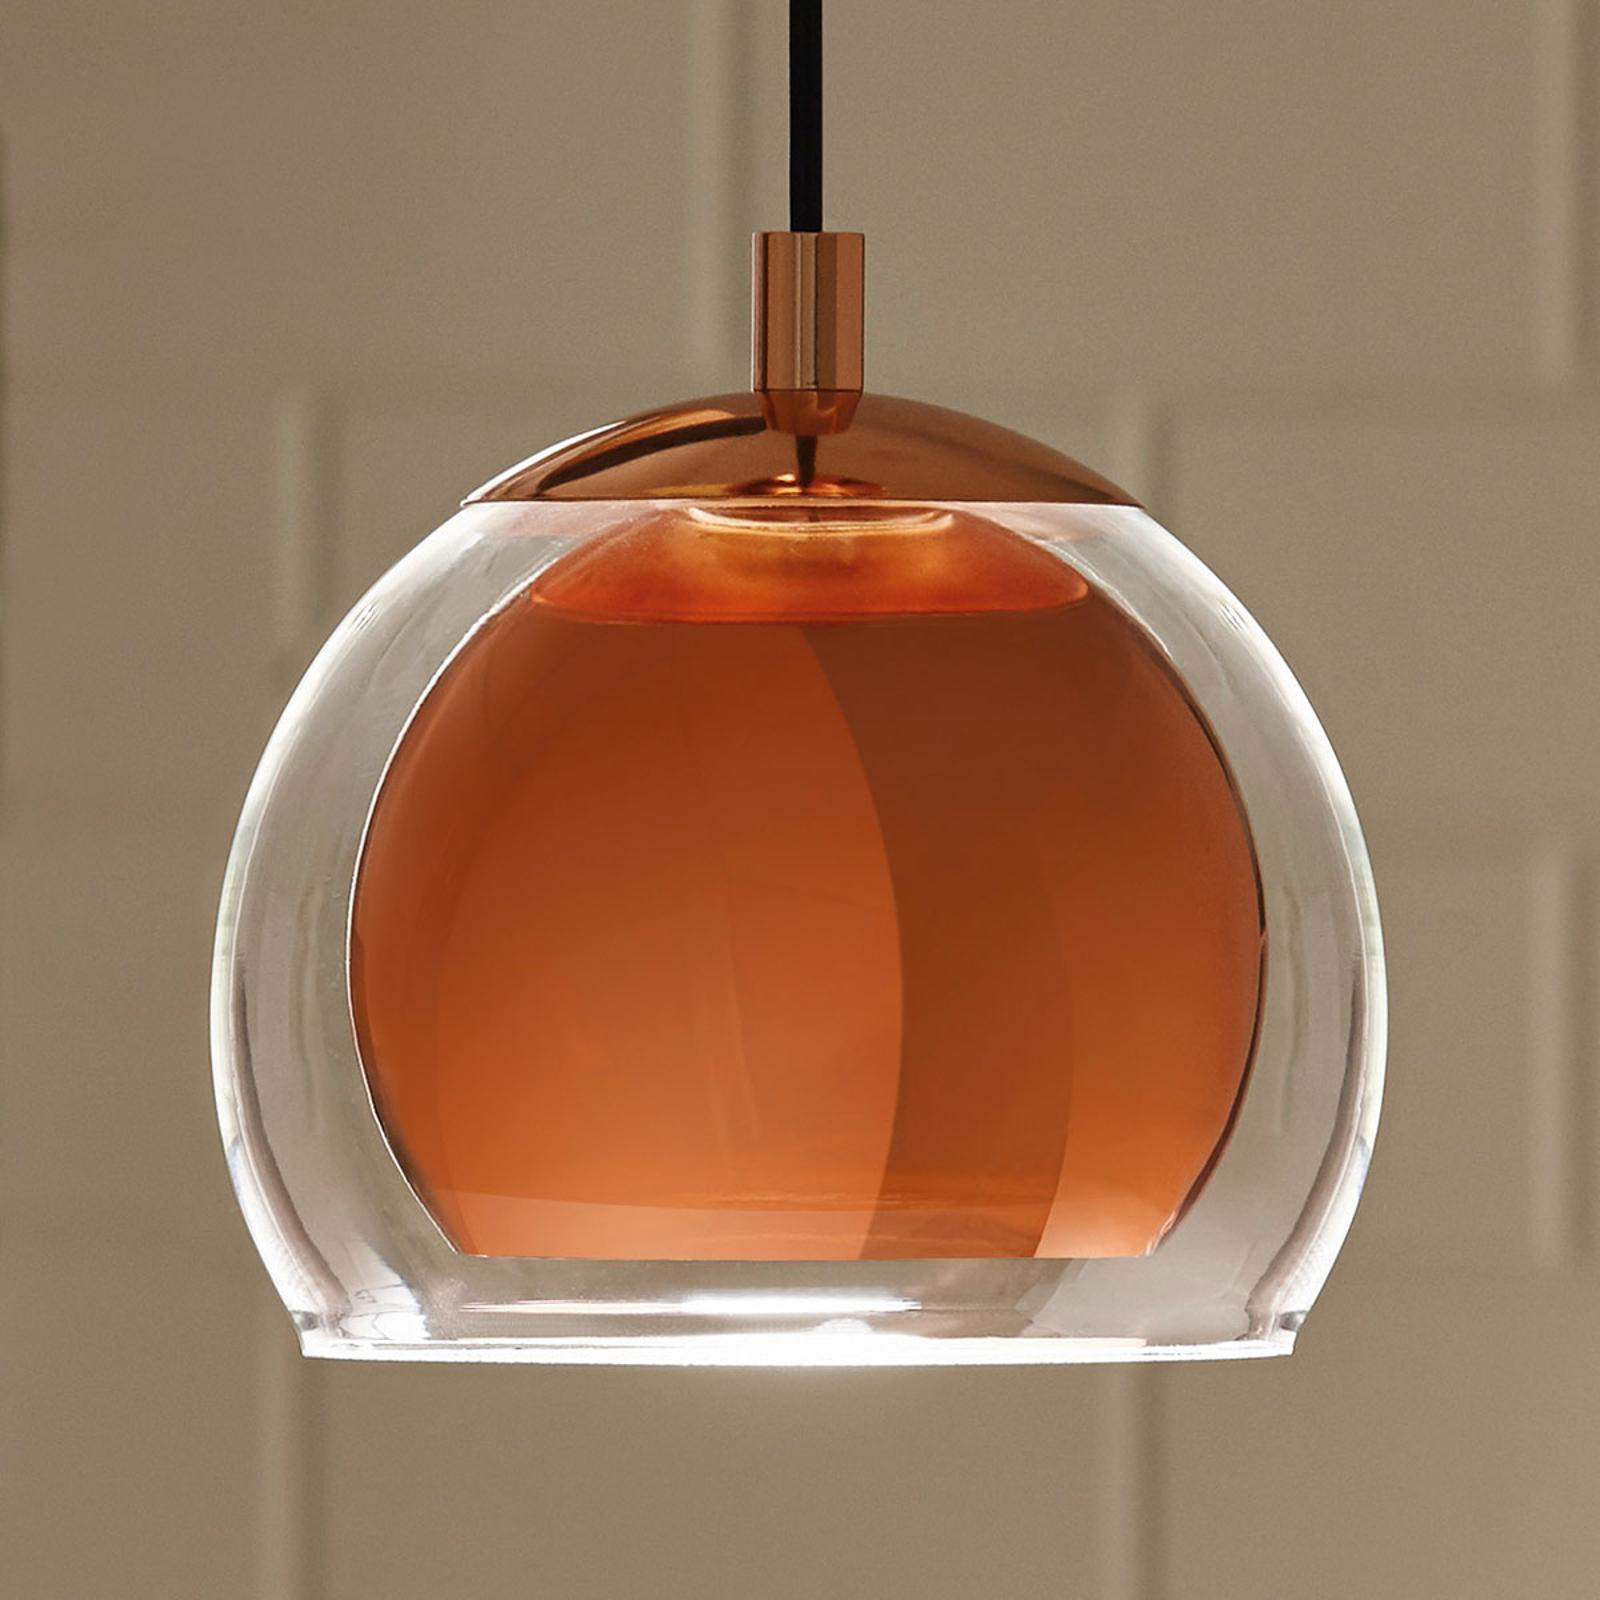 Kolor miedzi, lampa wisząca Rocamar